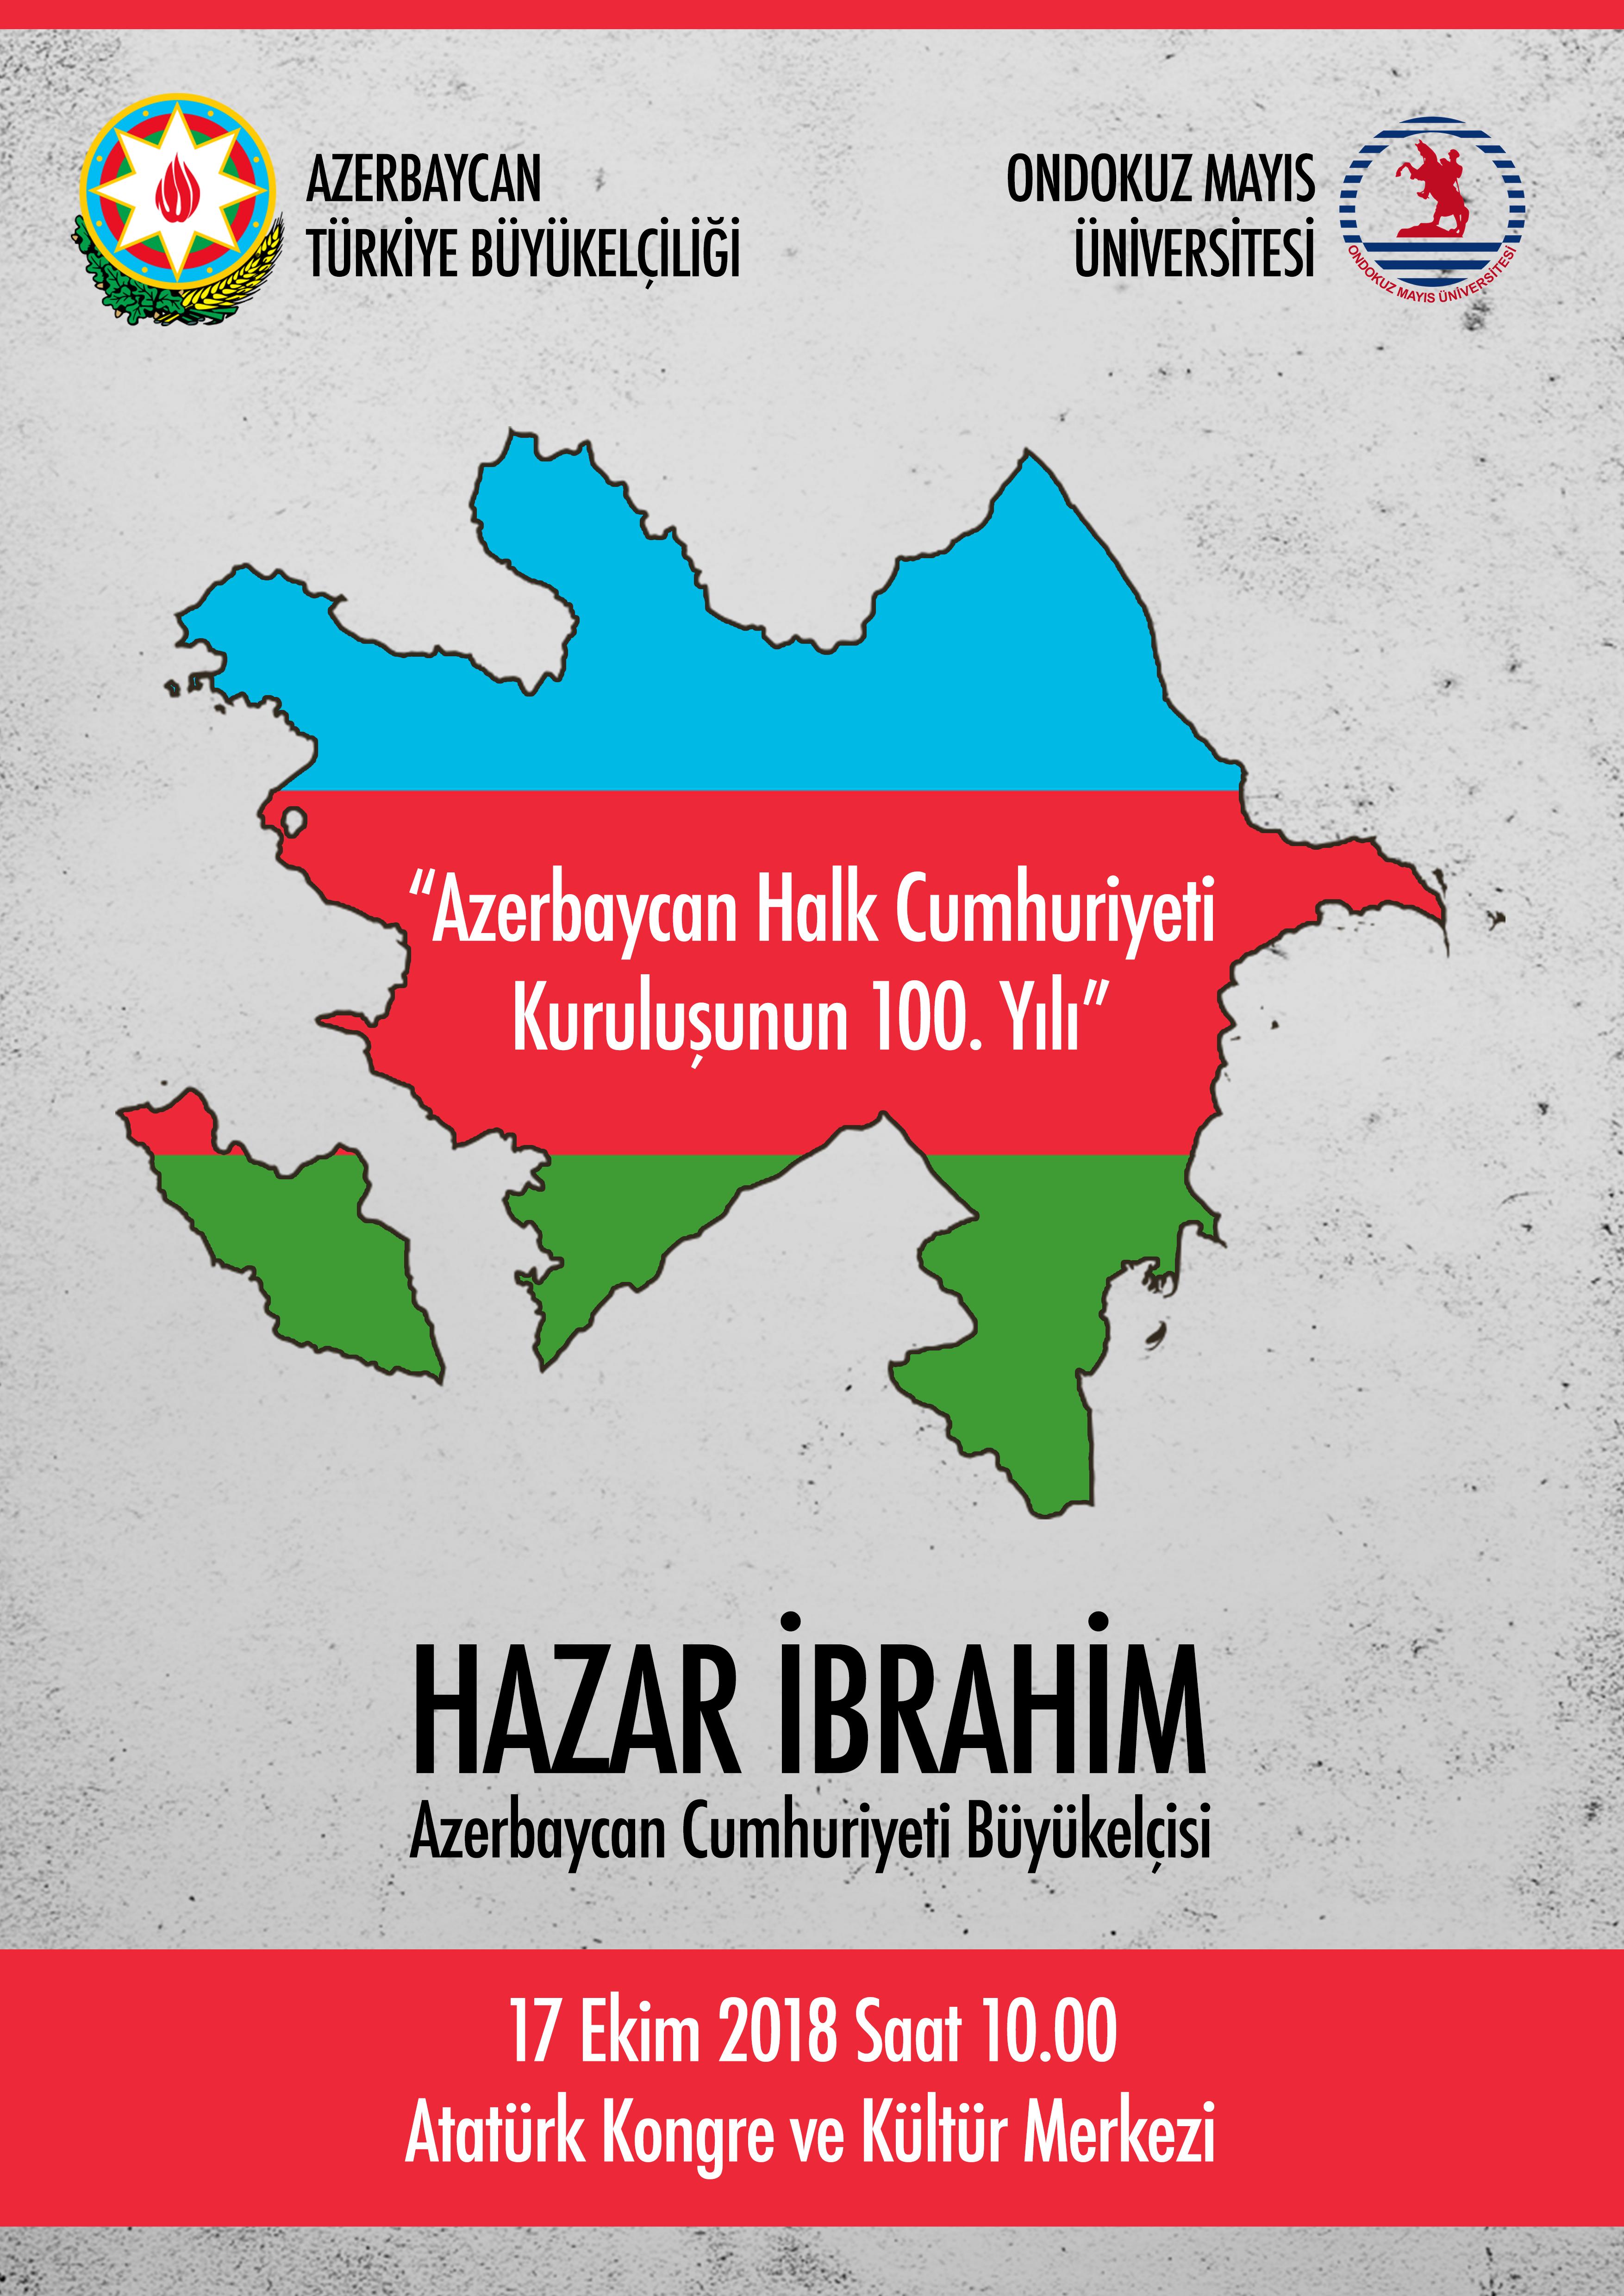 http://www.omu.edu.tr/sites/default/files/azerbaycan-belci-afis.png